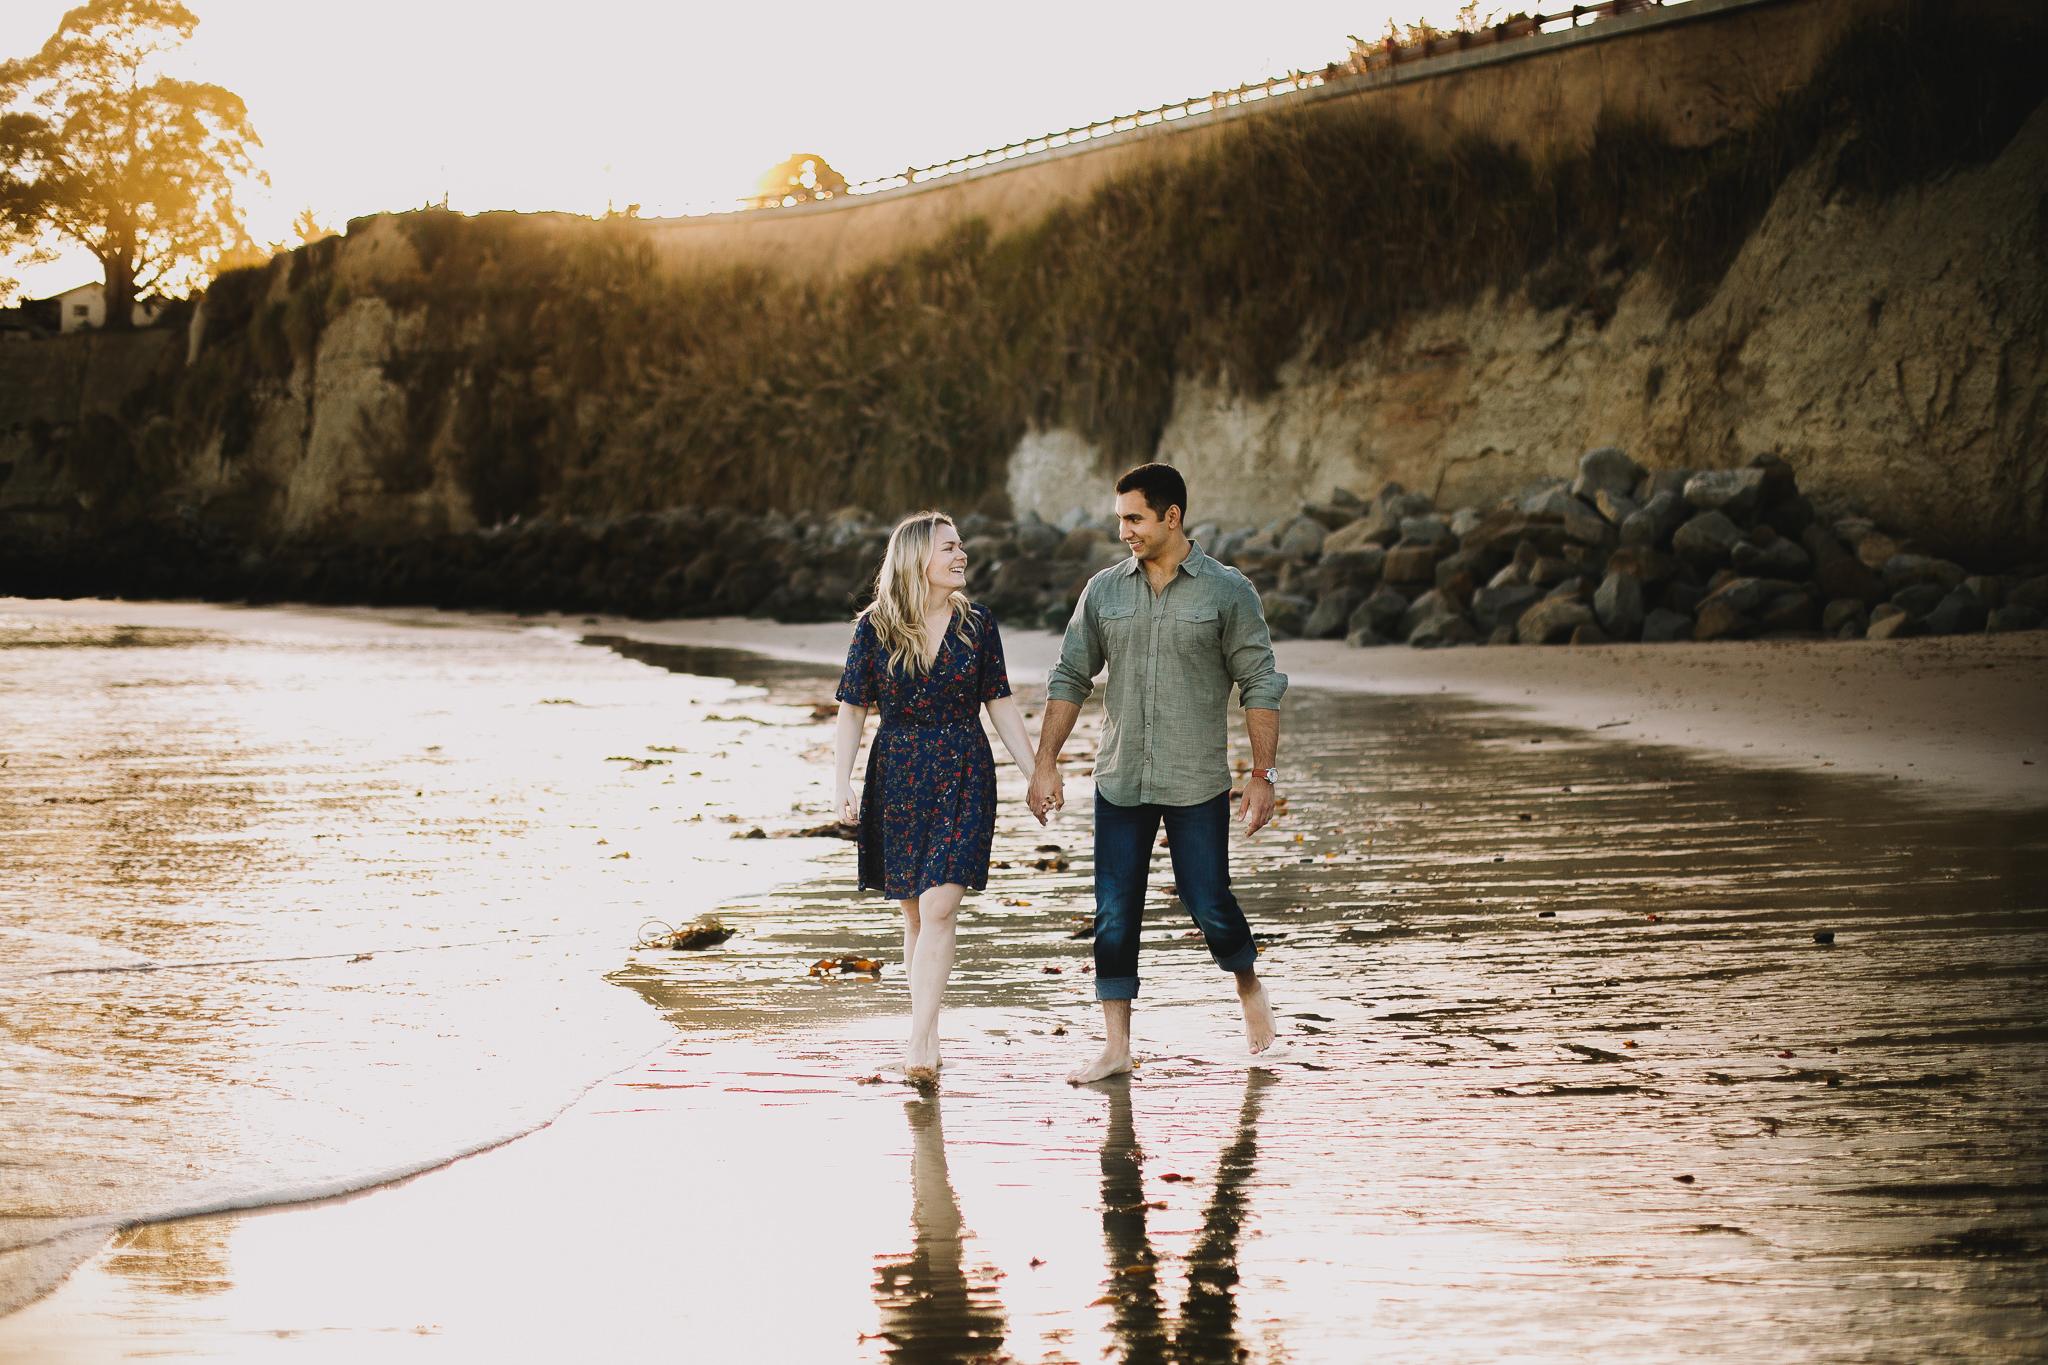 Archer Inspired Photography Capitola Beach Santa Cruz Wedding Engagement Lifestyle Session Photographer-86.jpg